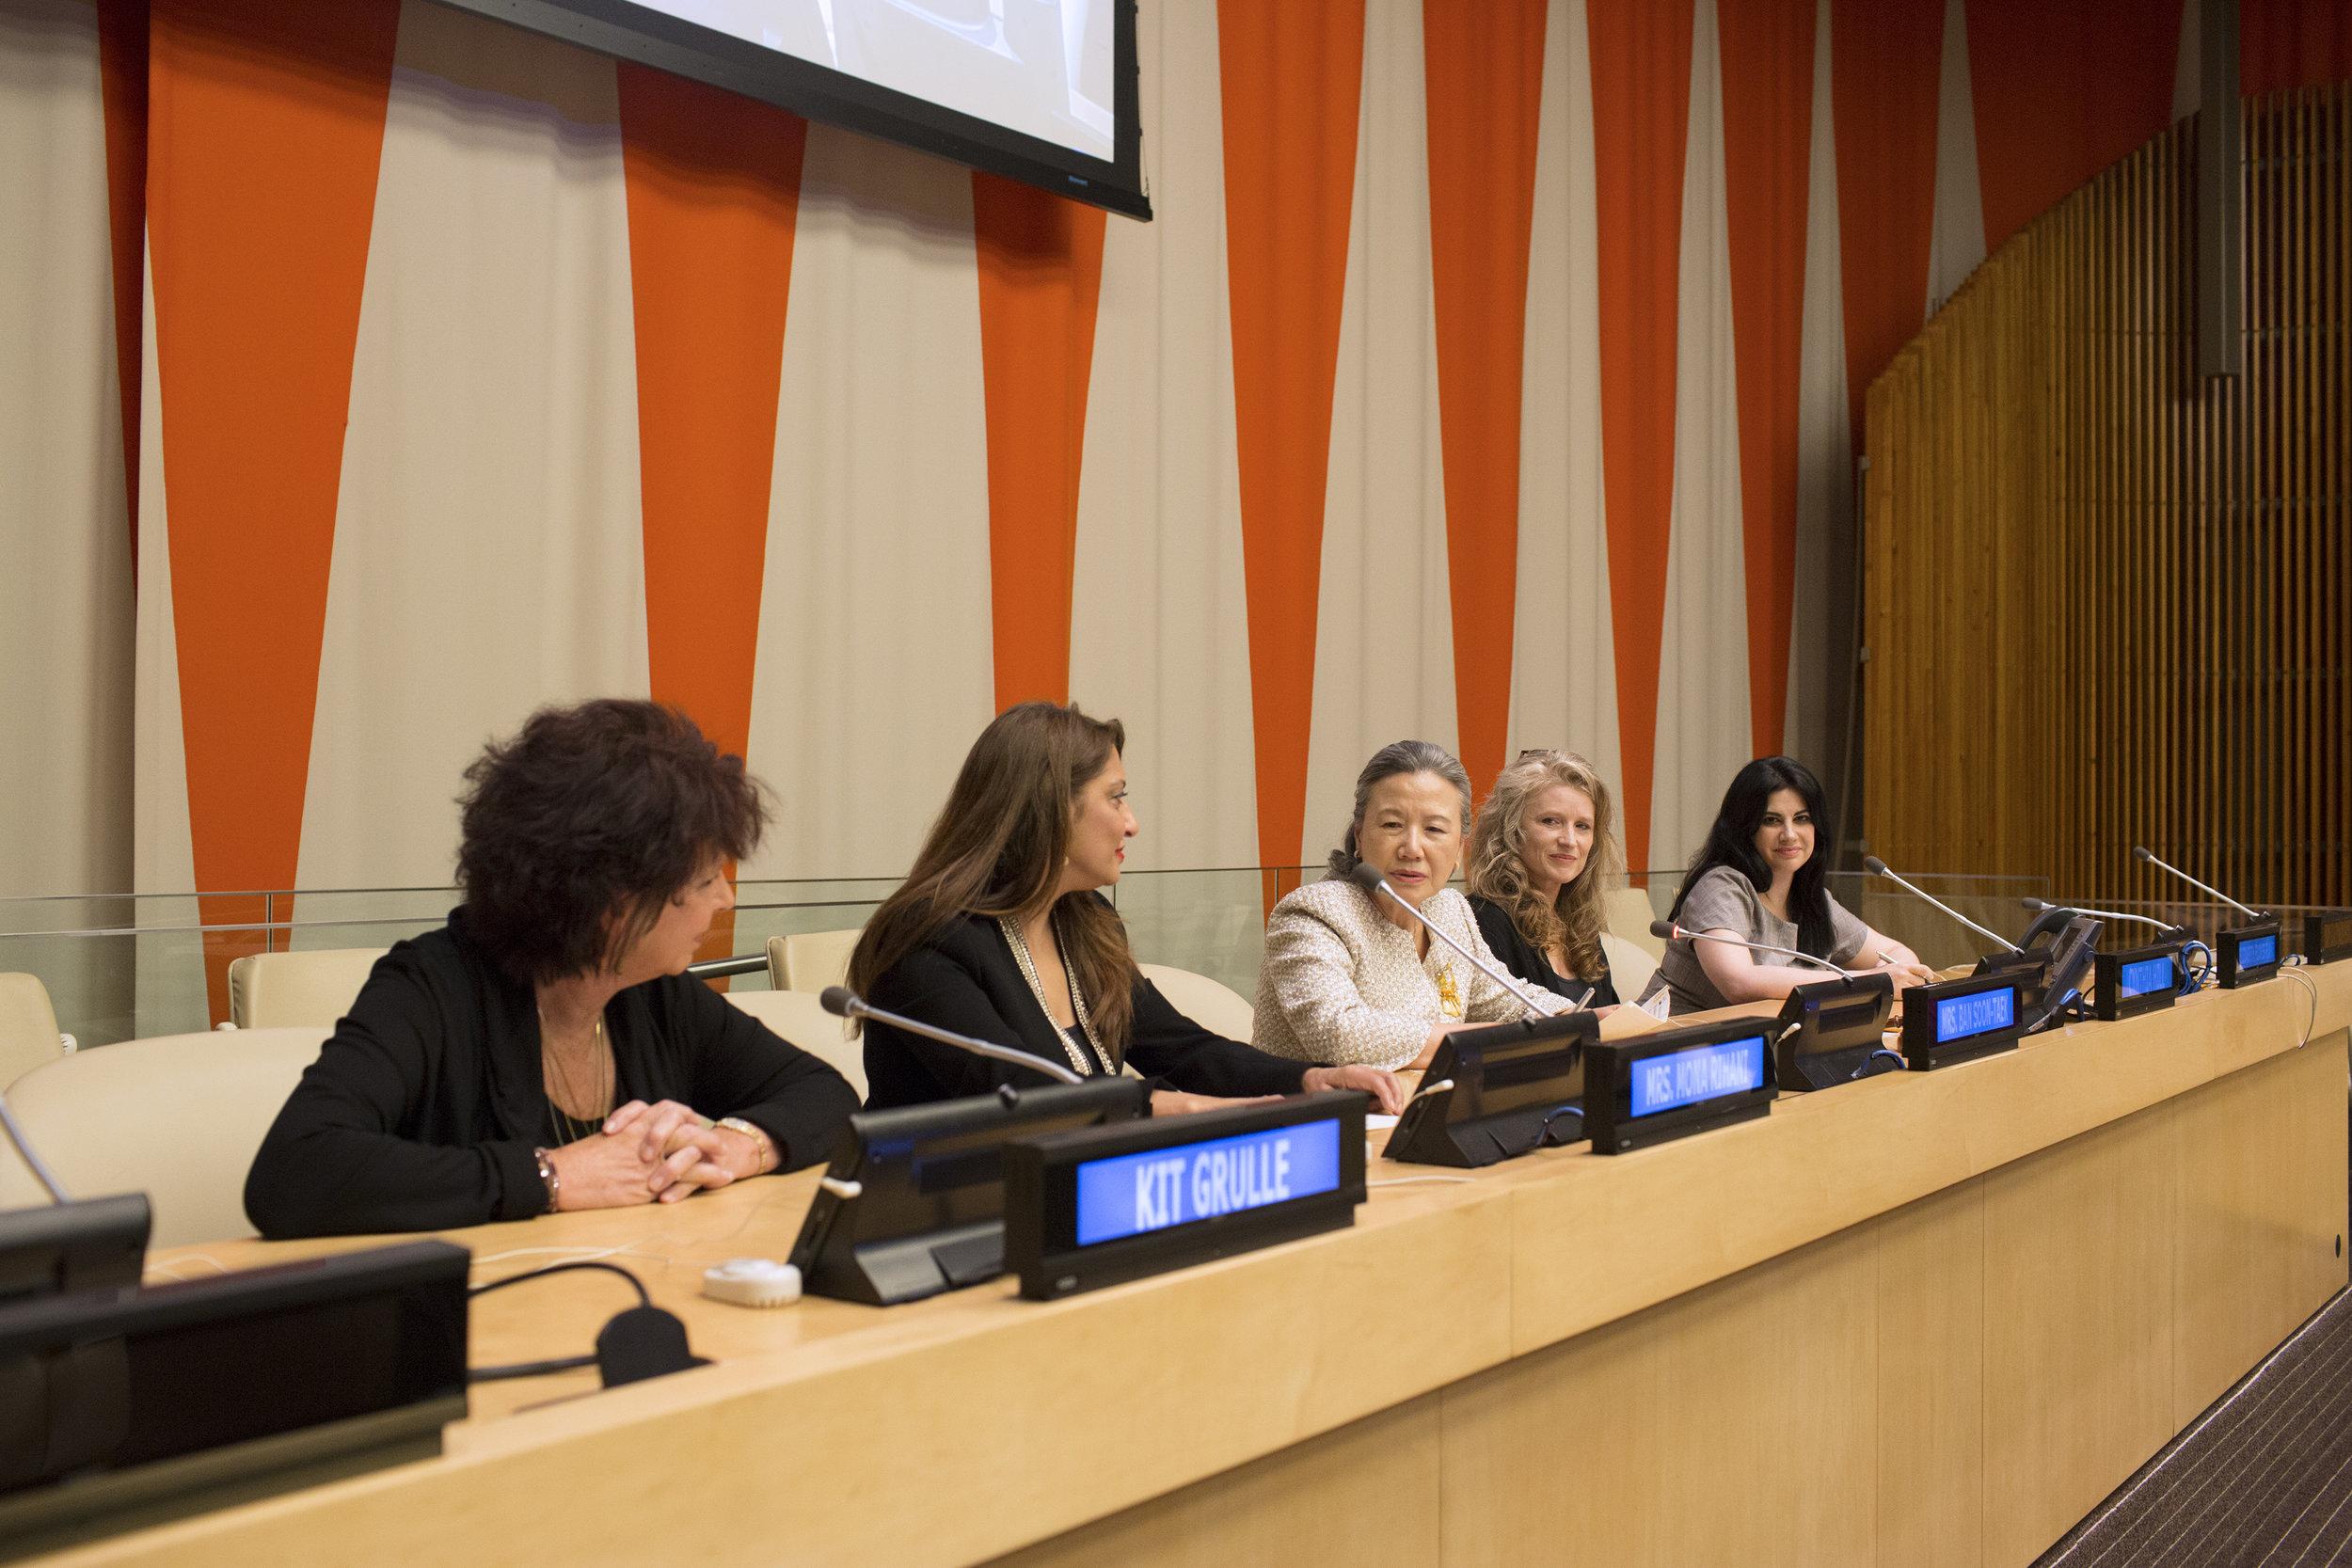 The Speakers Panel- Kit Gruelle, Muna Rihani Al-Nasser, H.E. Ban Soon-taek,  Filmmaker Cynthia Hill and Elizabeth Flores .JPG